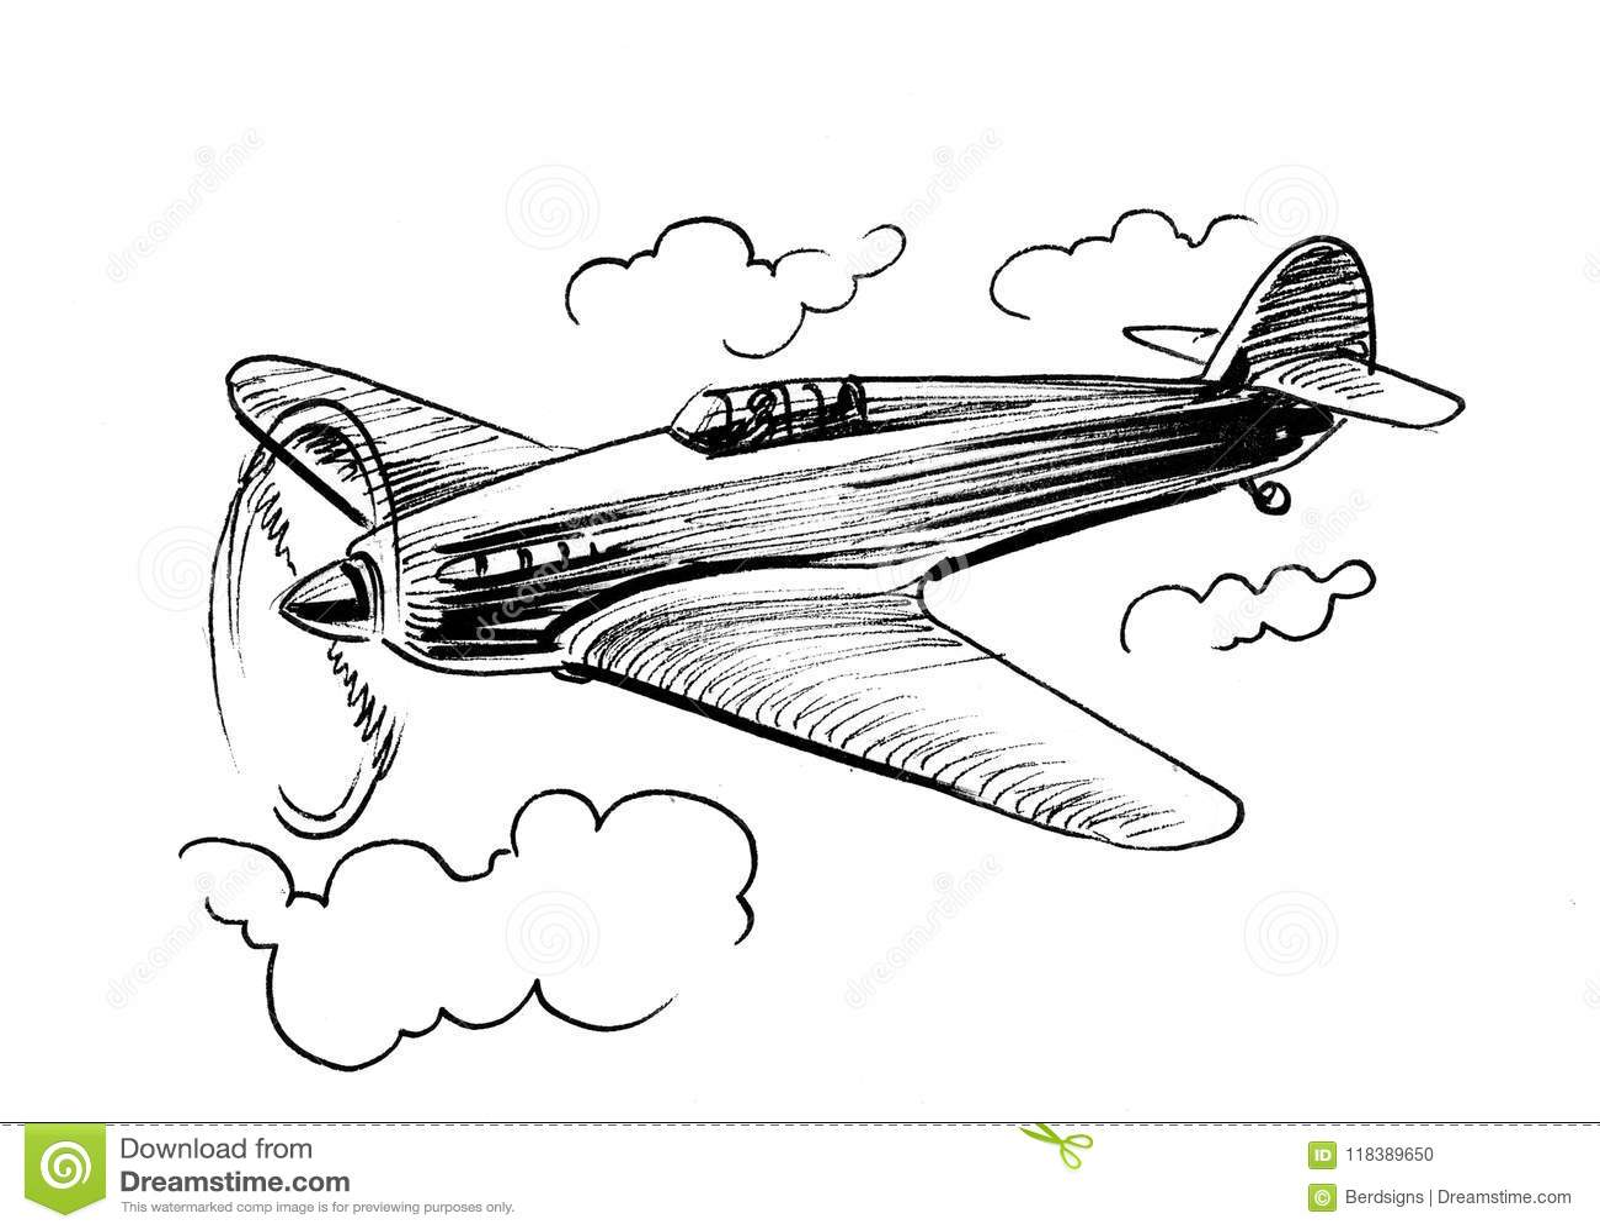 Old War Plane Stock Illustration Illustration Of White 118389650